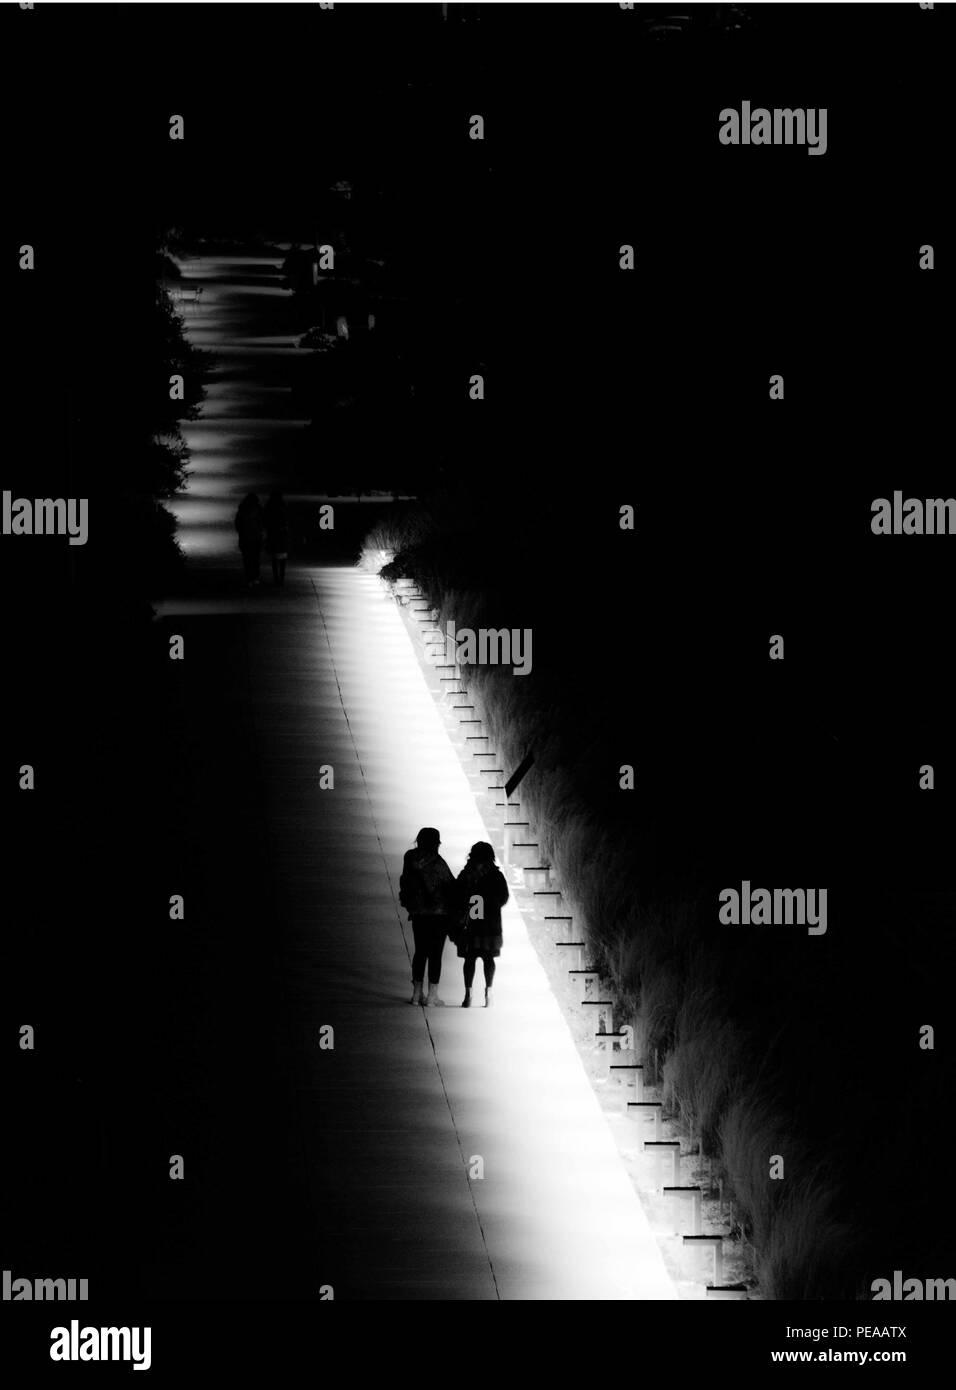 Night walk at the park - Stock Image